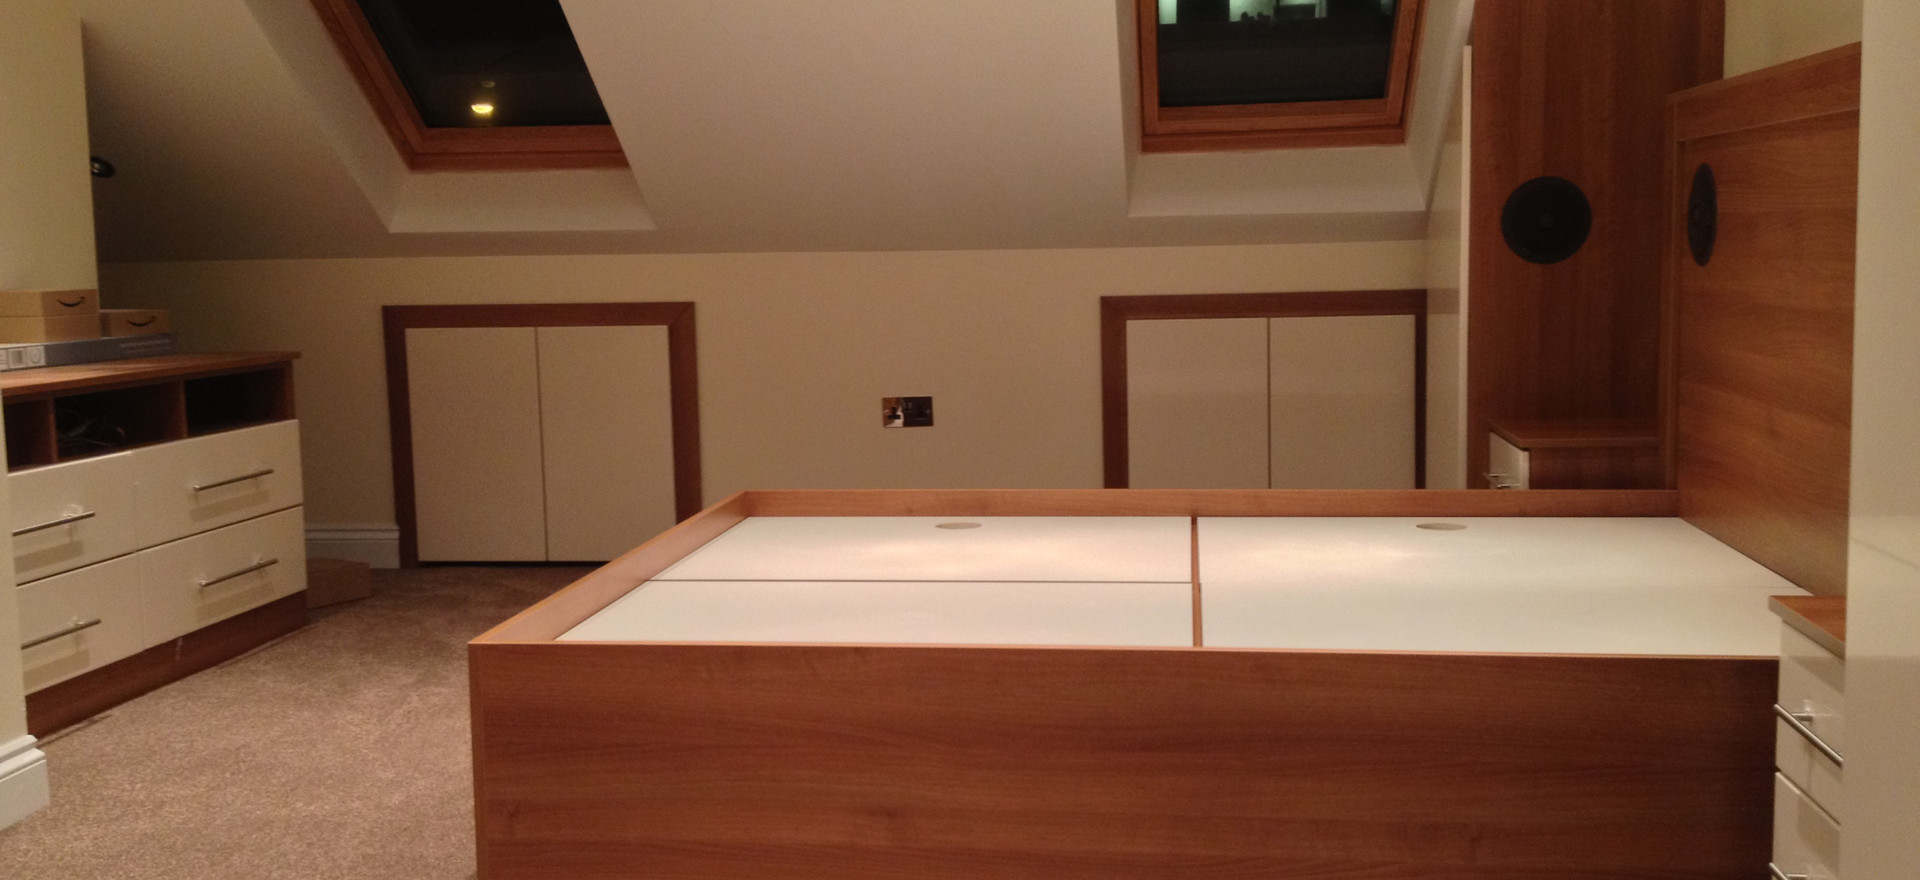 Loft Wardrobes and Bed